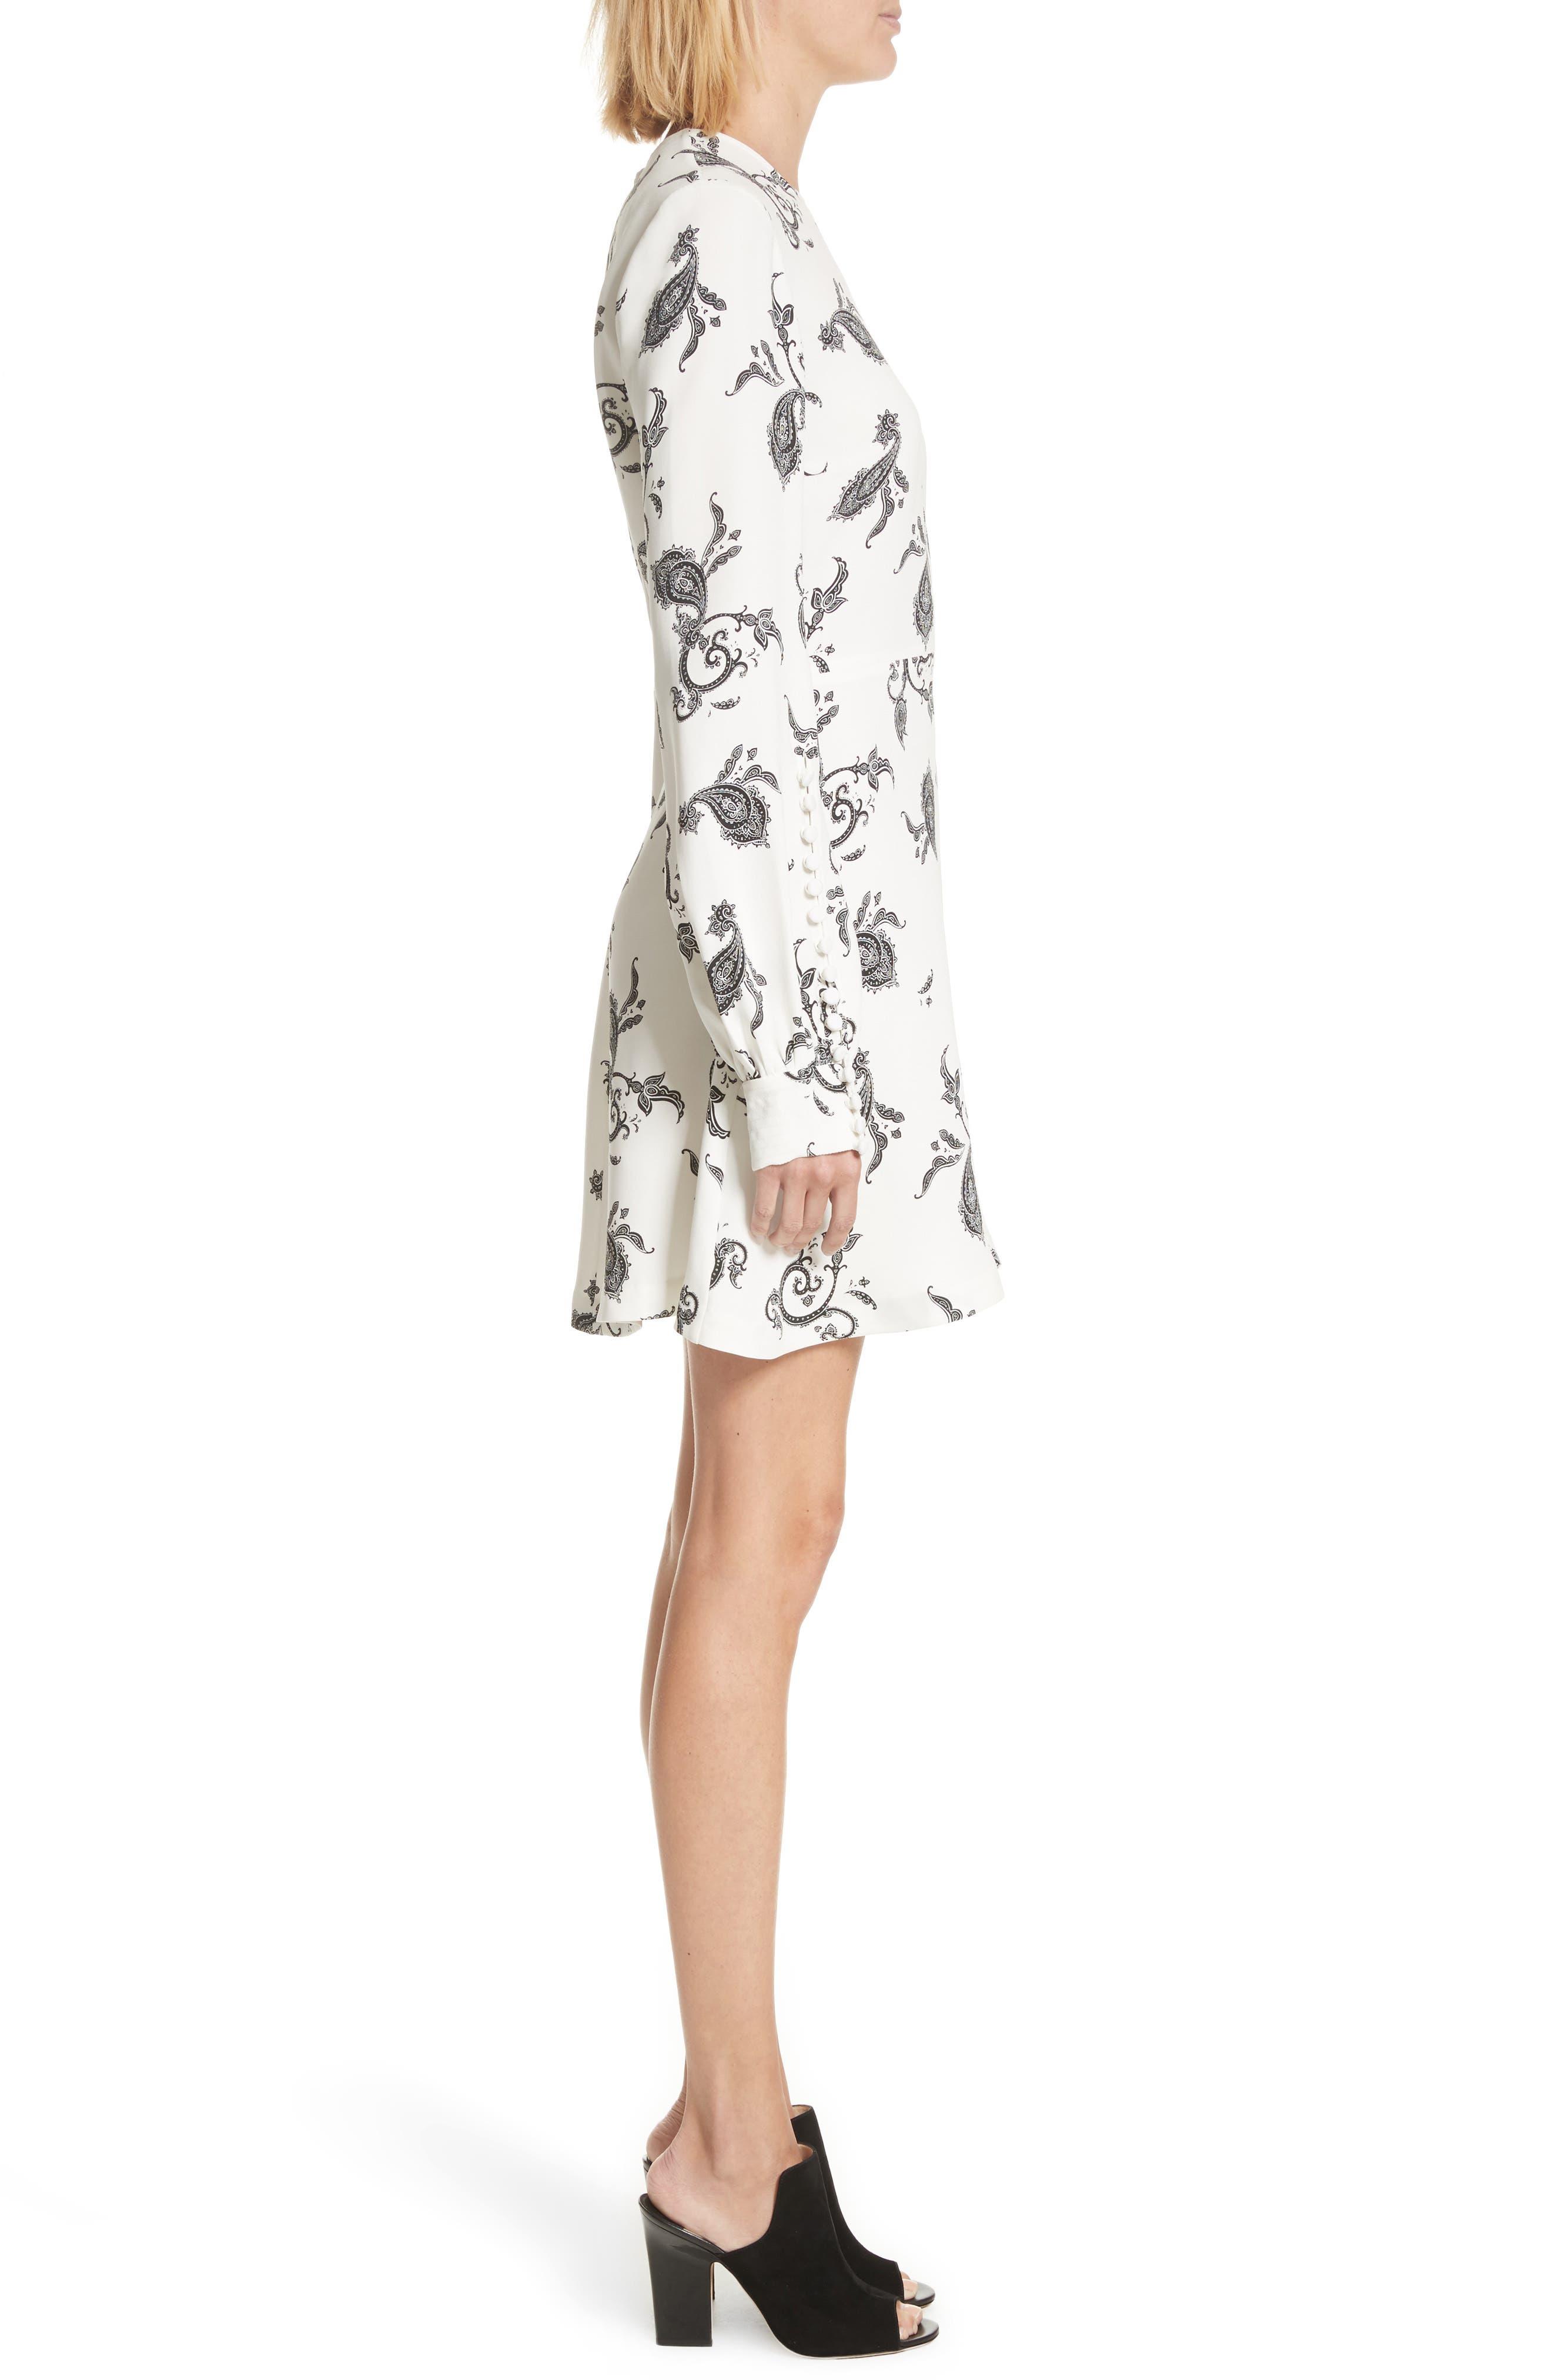 Lauren Print Silk Dress,                             Alternate thumbnail 3, color,                             904